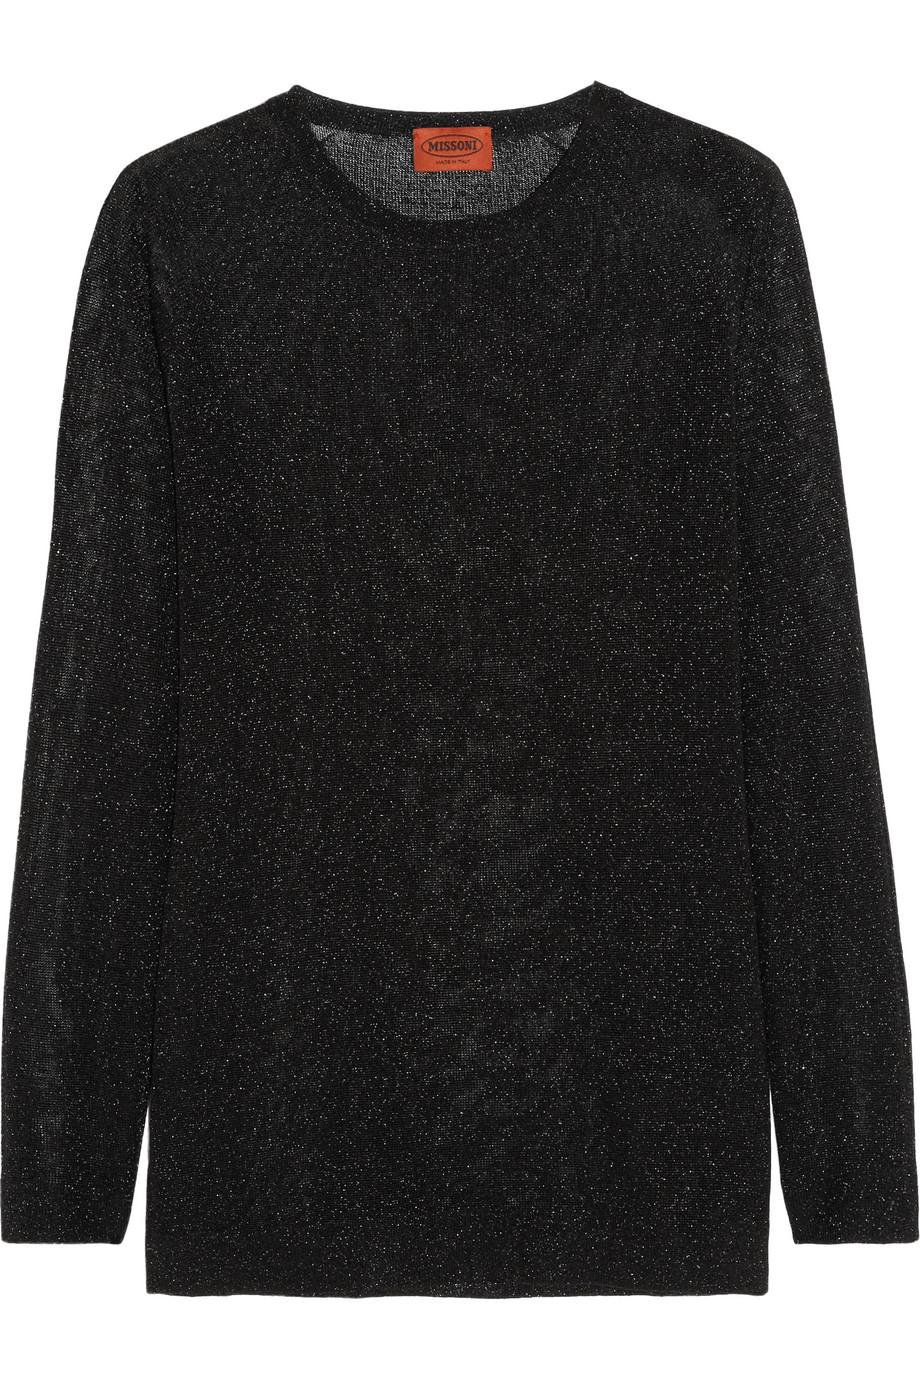 Missoni Metallic Crochet-Knit Top, Black, Women's, Size: 44